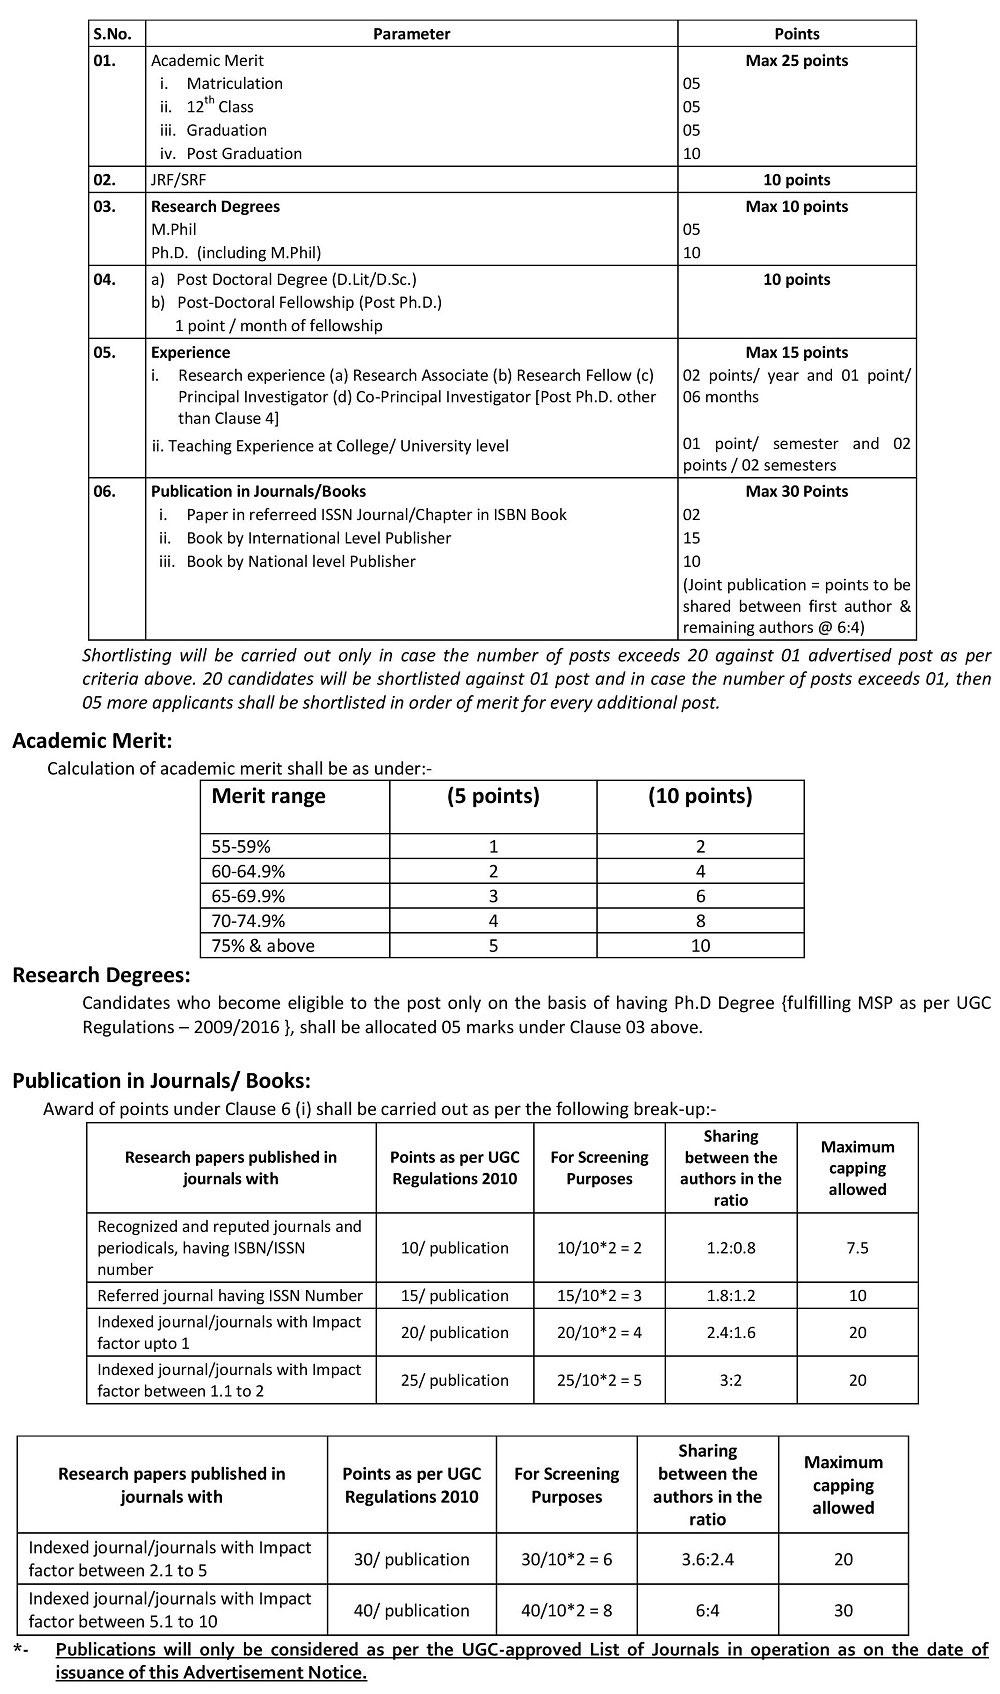 University of Kashmir Assistant Professor Recruitment 2018 - Shortlisting Criteria